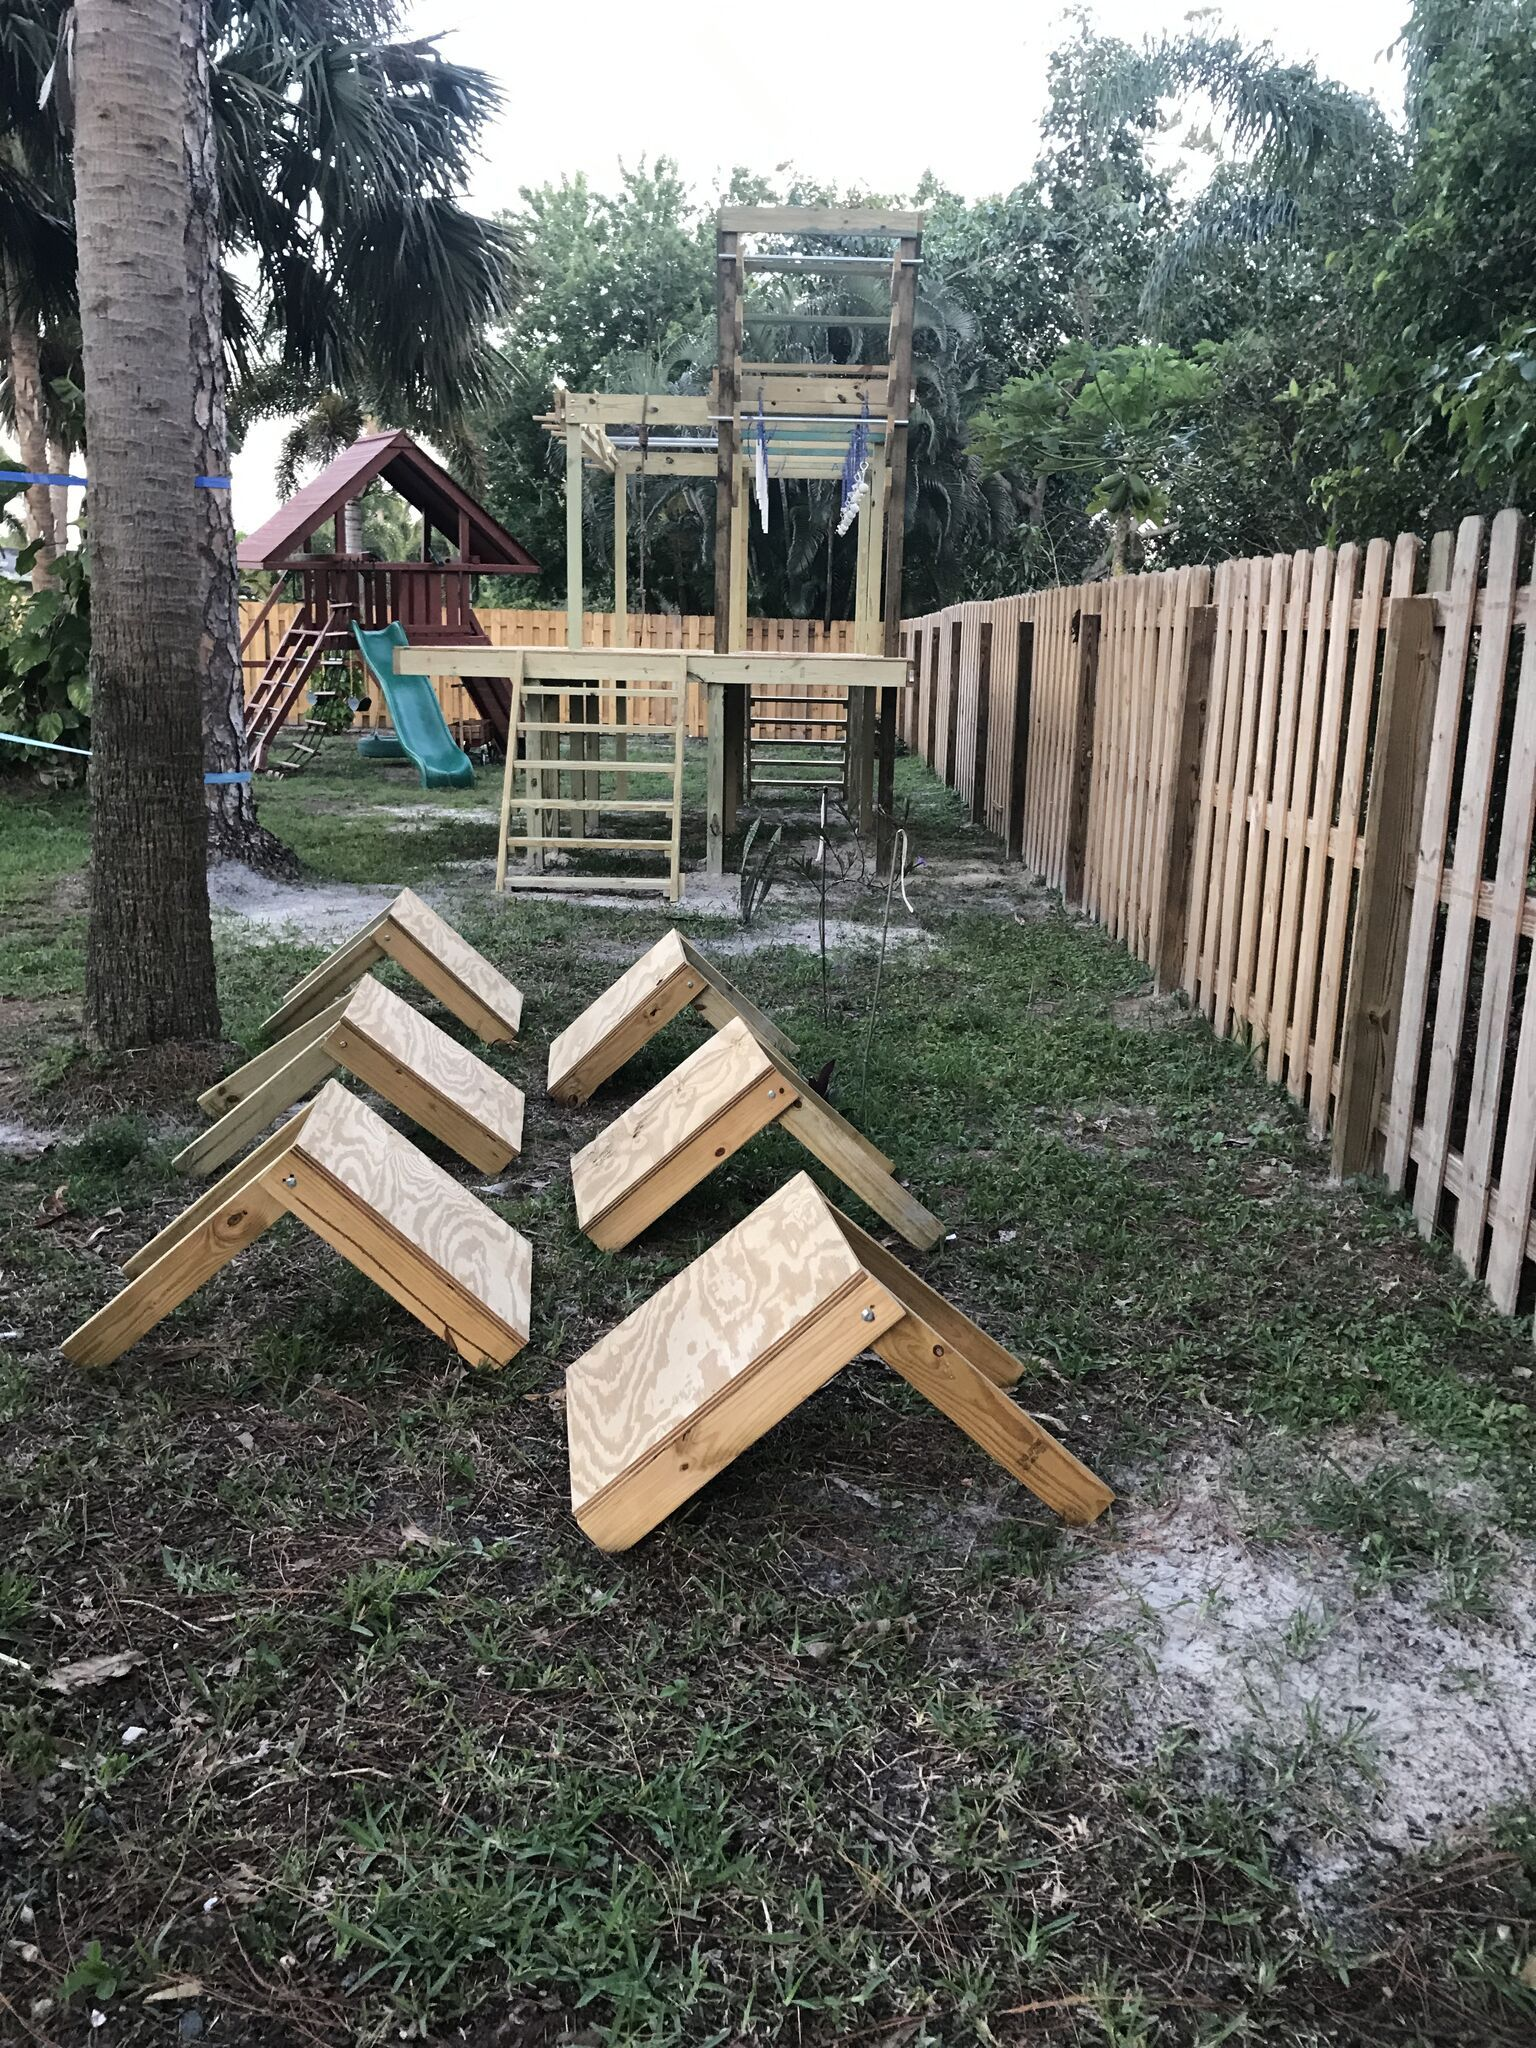 Build Your Own Ninja Warrior Course Backyard Obstacle Course Ninja Warrior Course Backyard